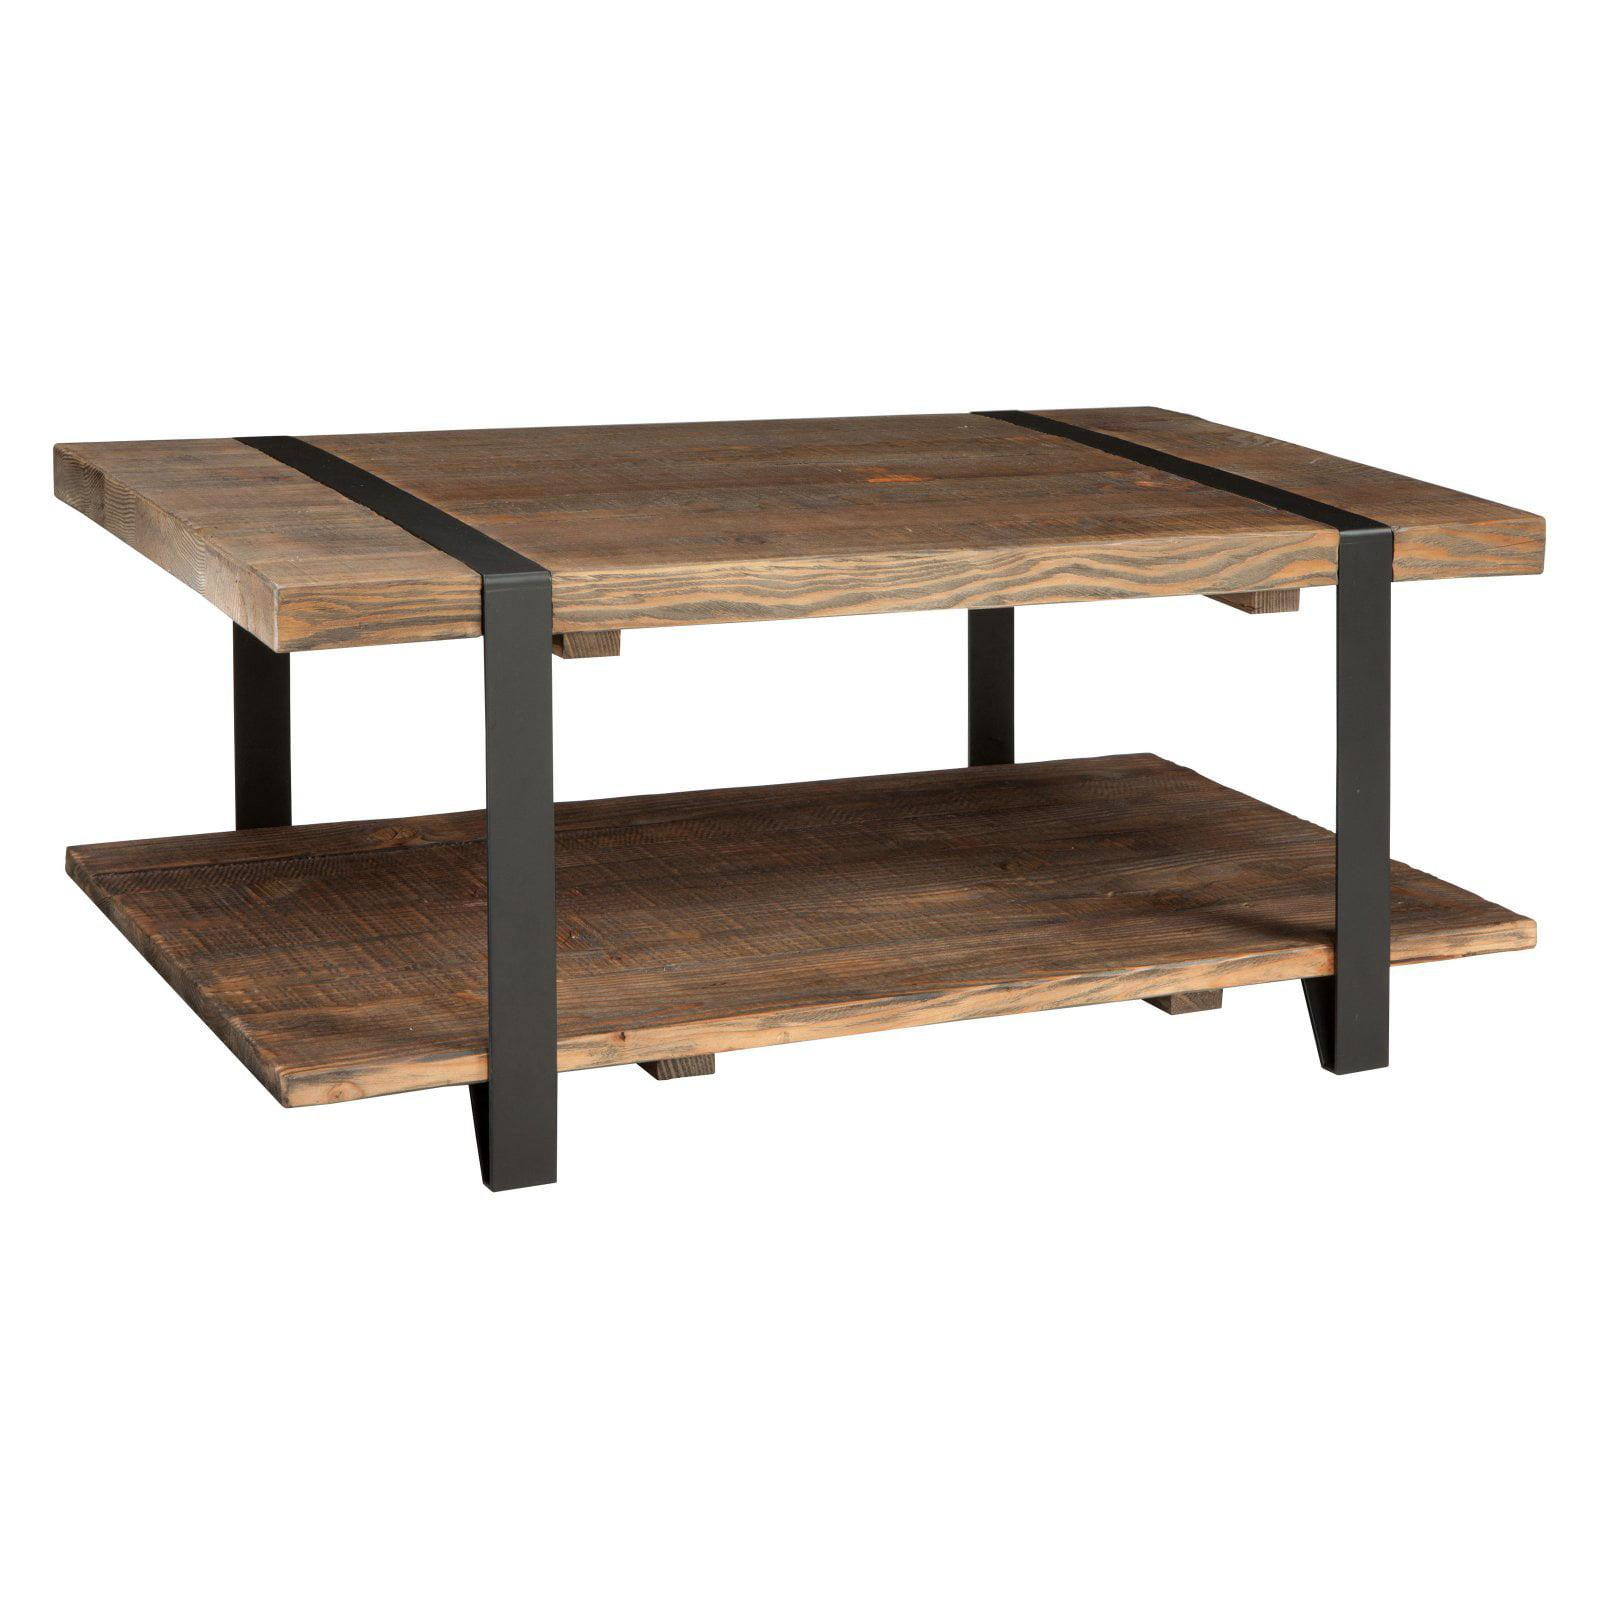 Modesto Coffee Table, Rustic Natural